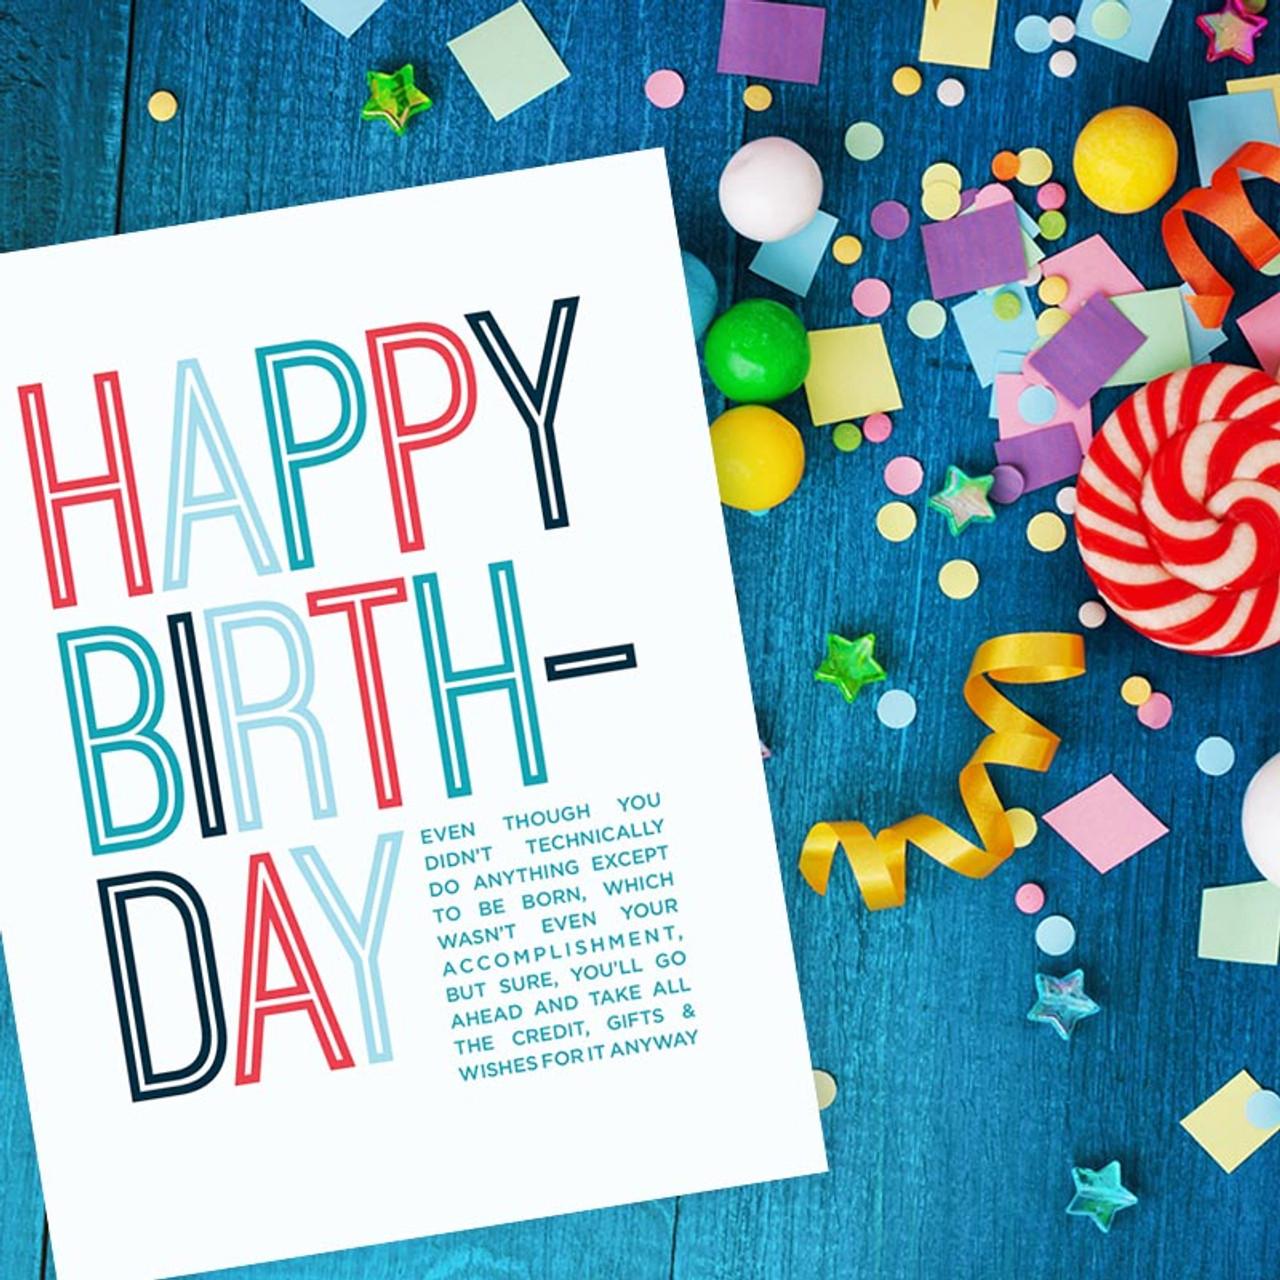 Happy Birthday Mooch Card - Sarcastic Birthday